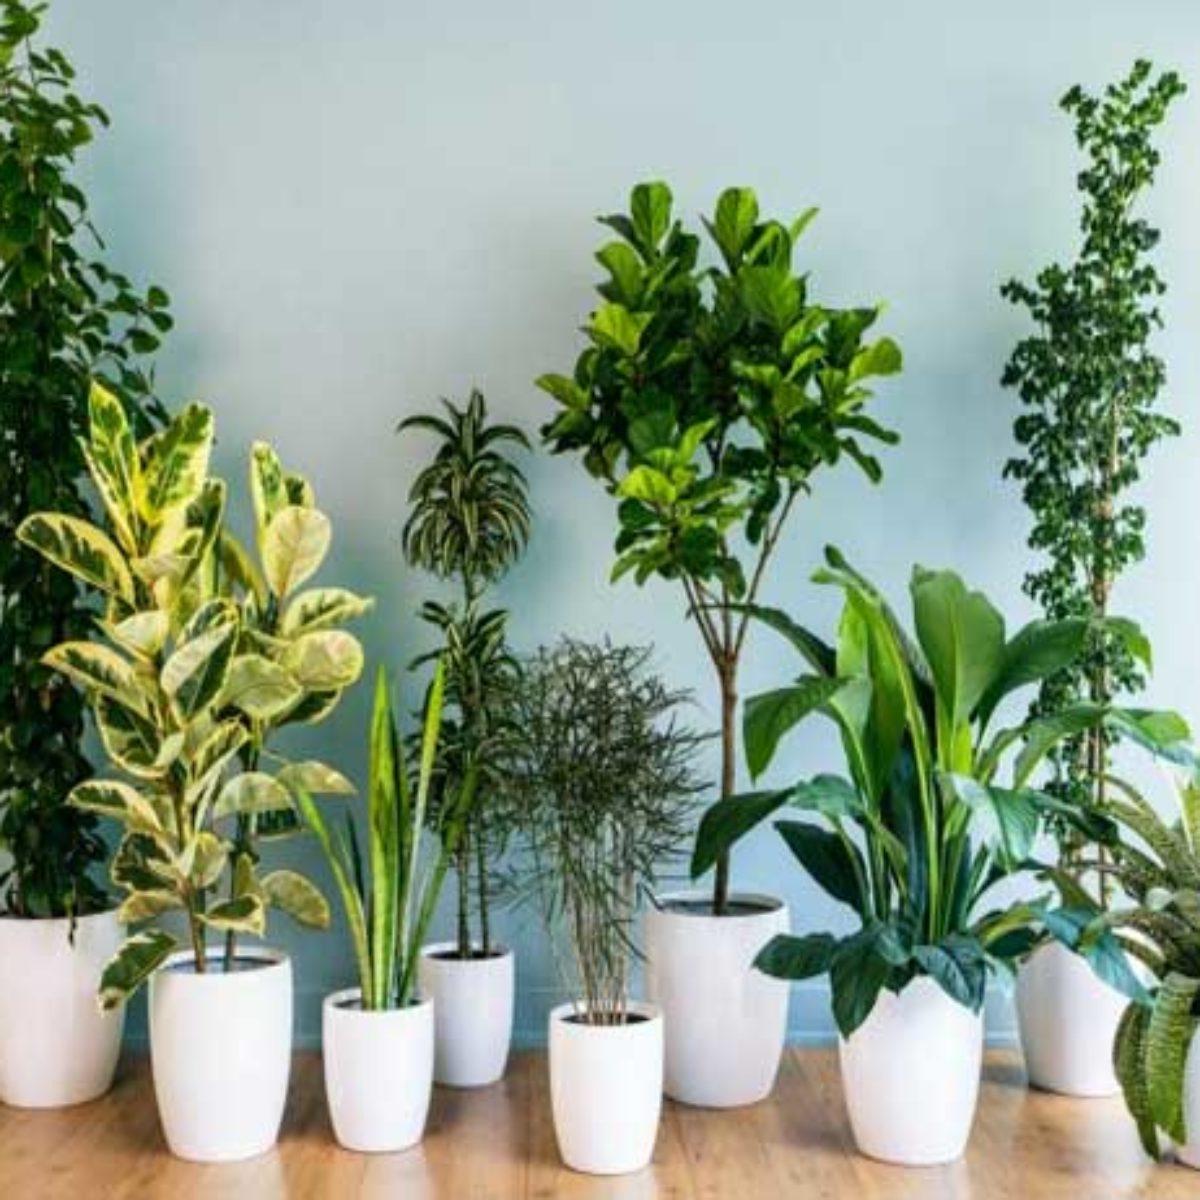 5 Plants That Should Not Be Kept Inside